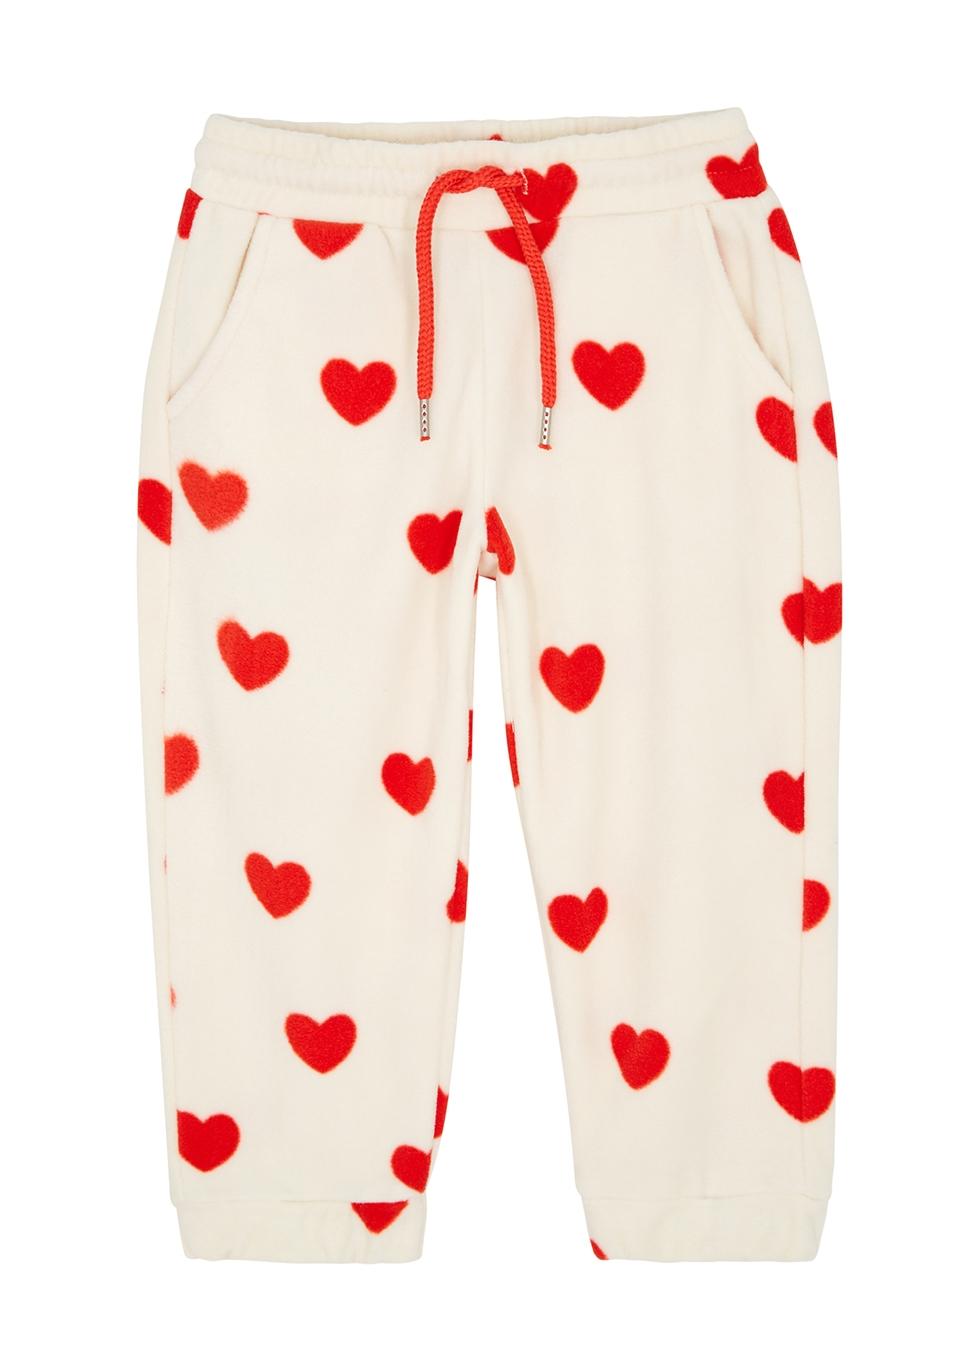 Hearts printed fleece sweatpants